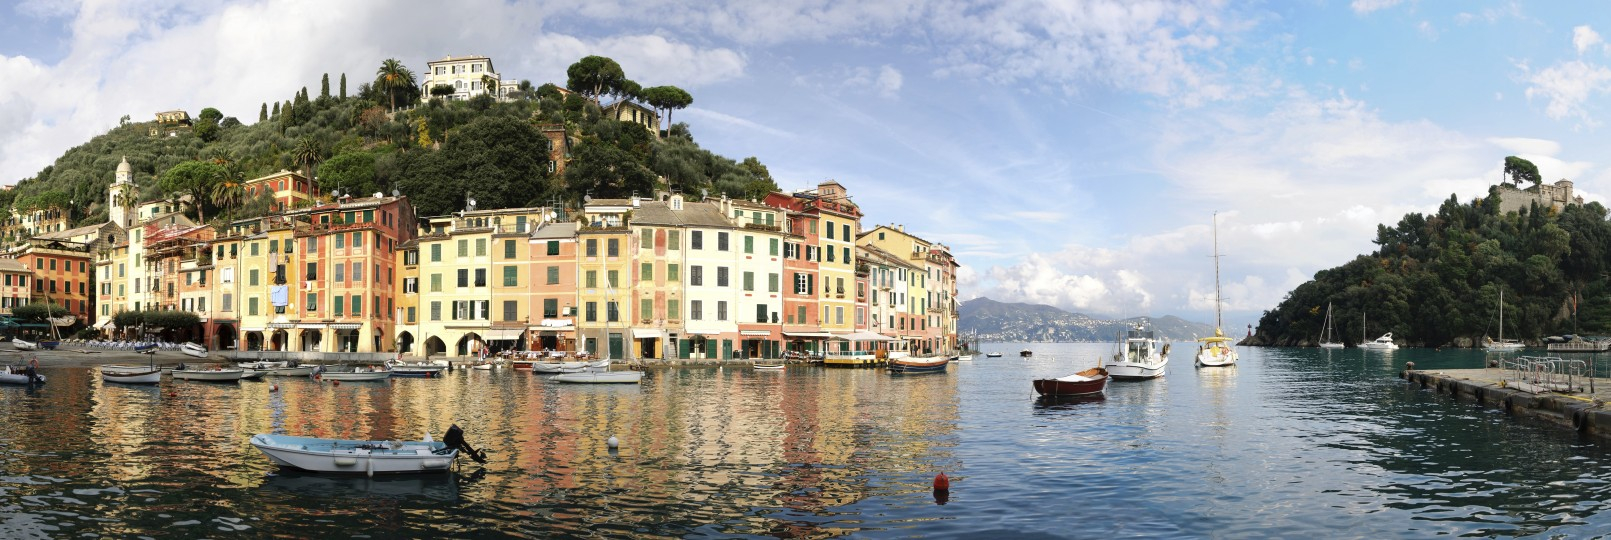 Portofino yacht charte...